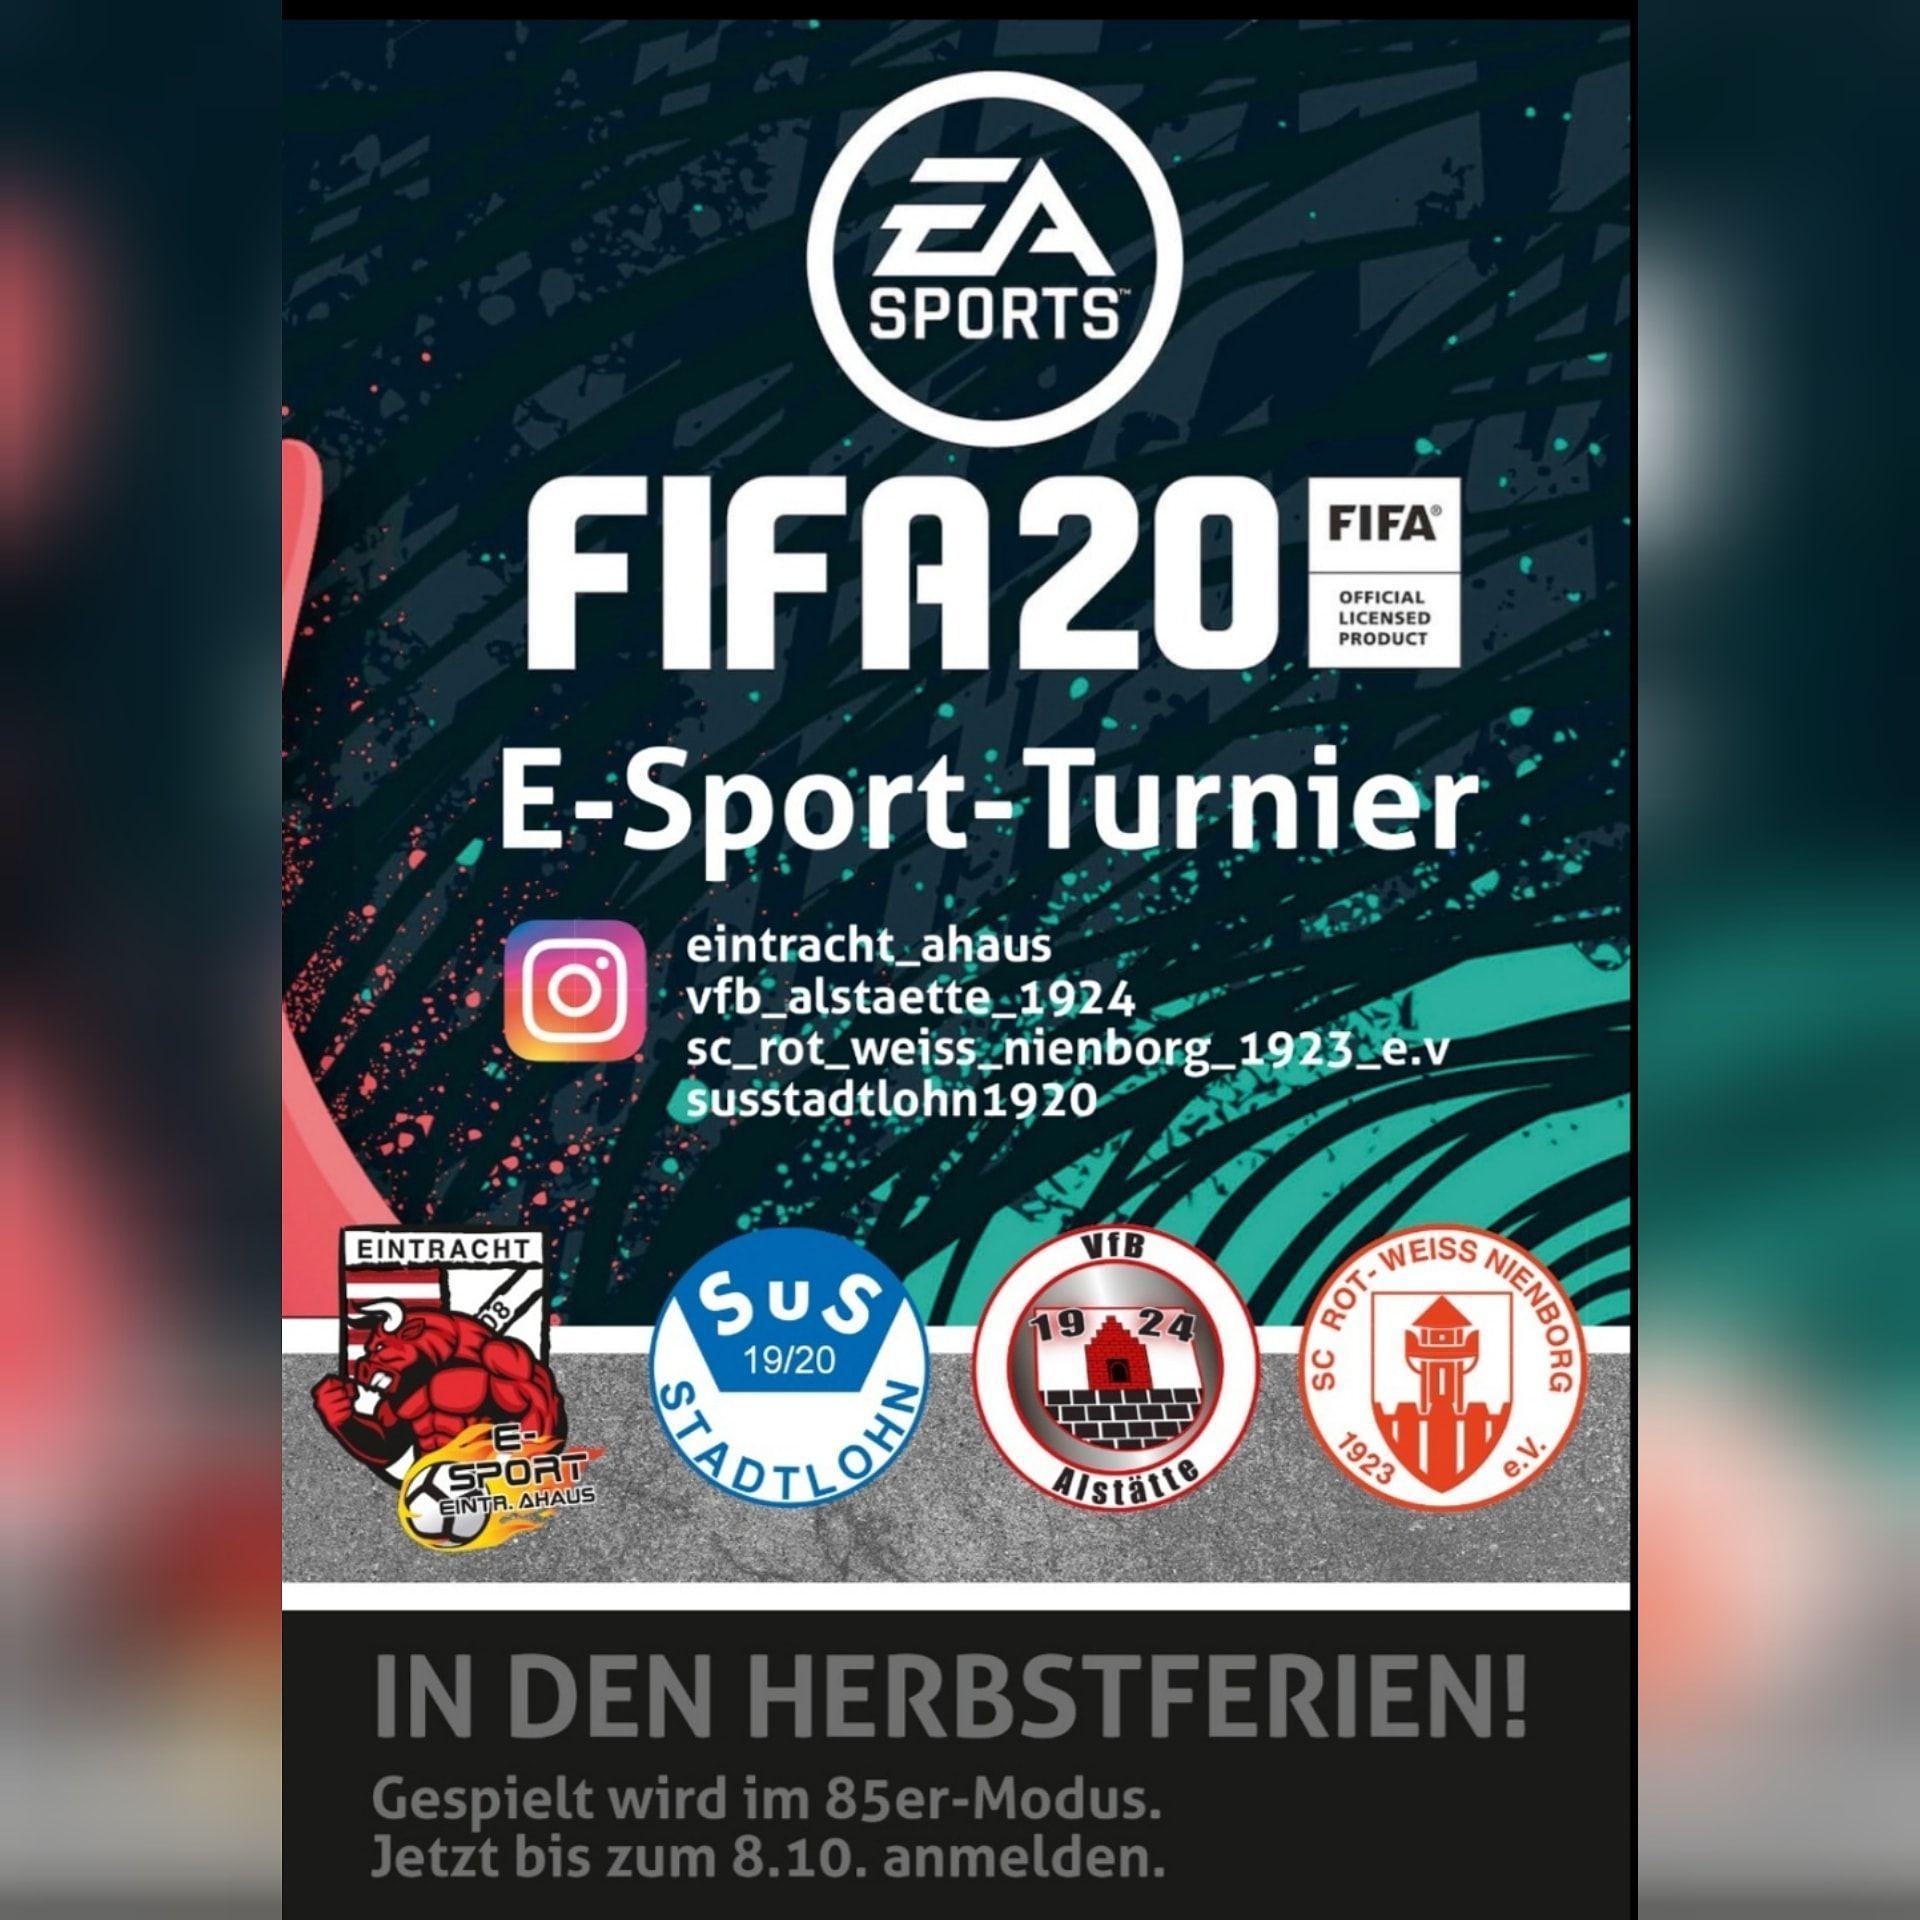 FIFA 20 Turnier - esports | VfB Alstätte 1924 e.V.